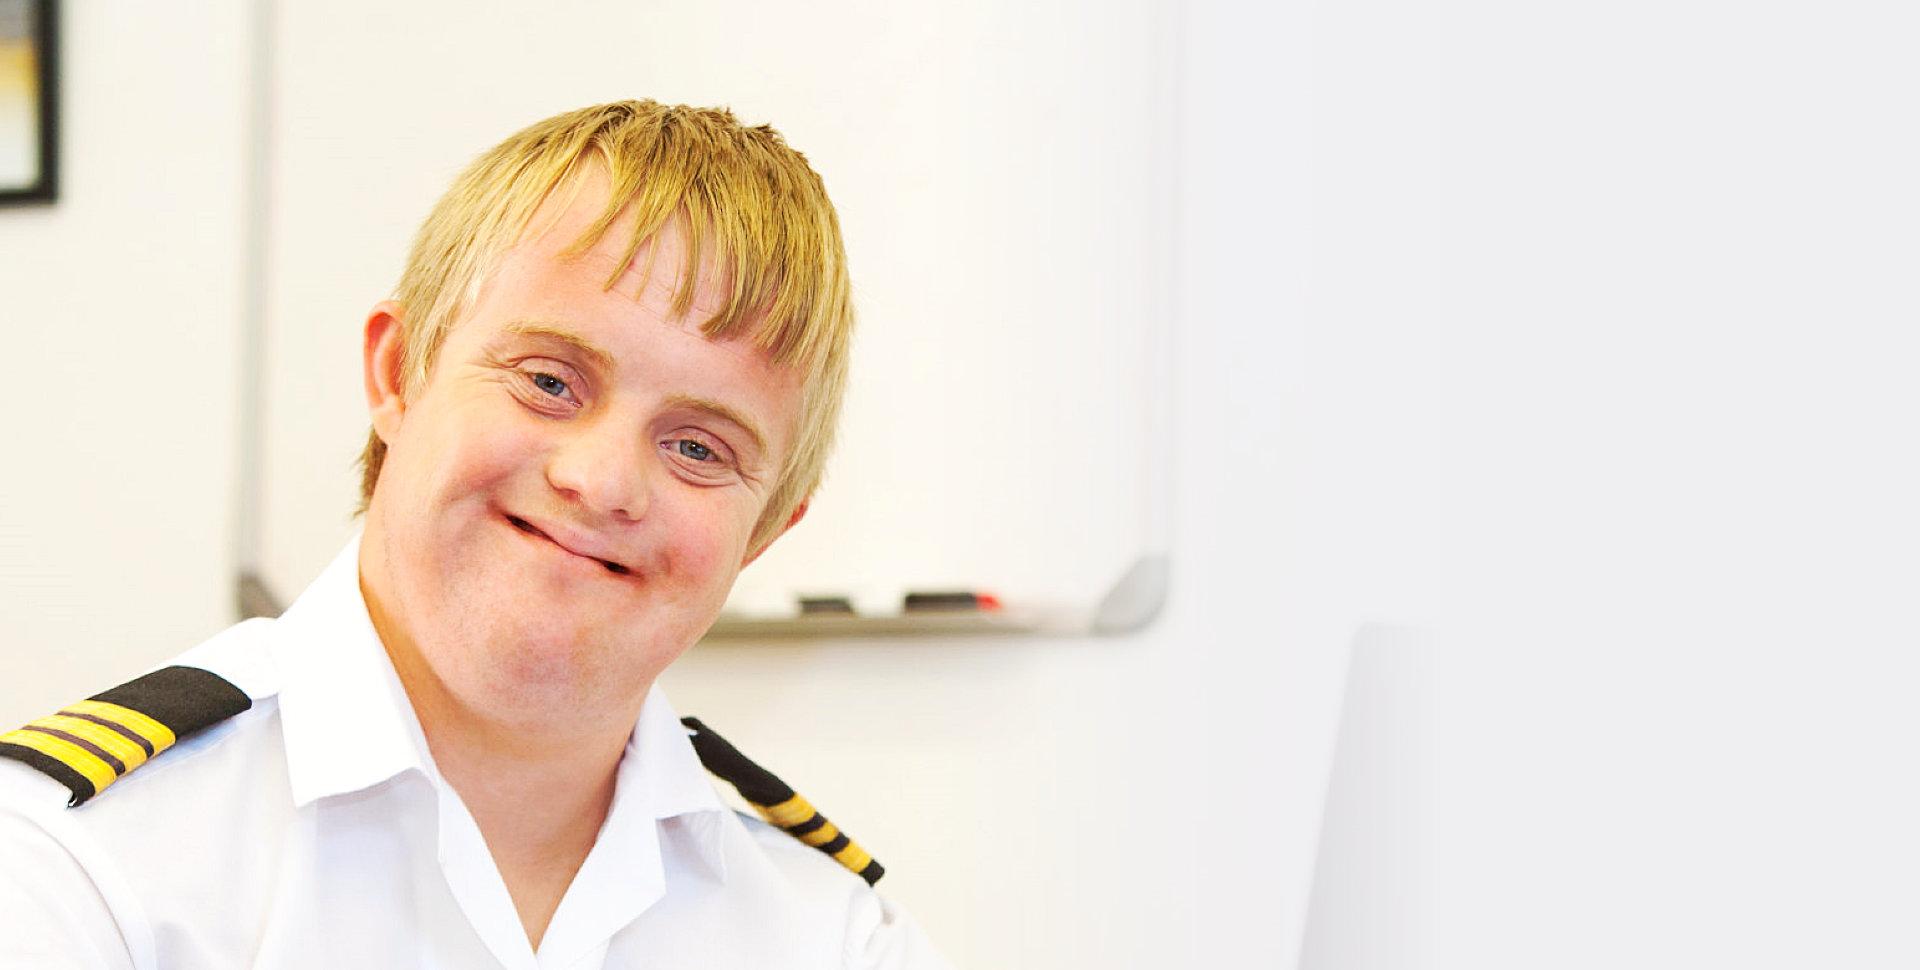 happy child wearing a seafarer's uniform